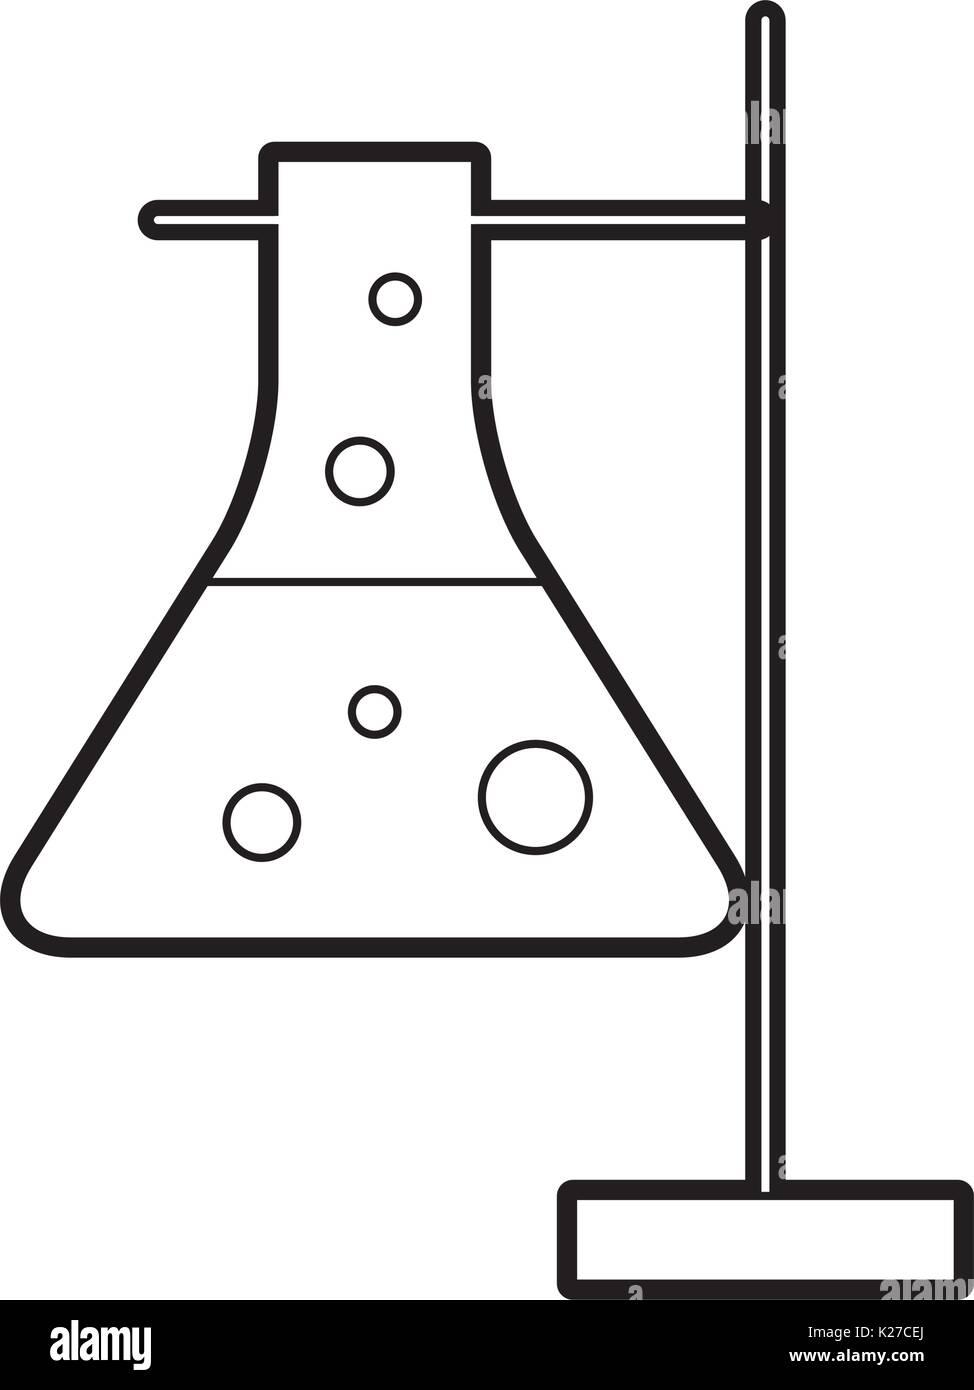 hight resolution of laboratory tube test with burner base